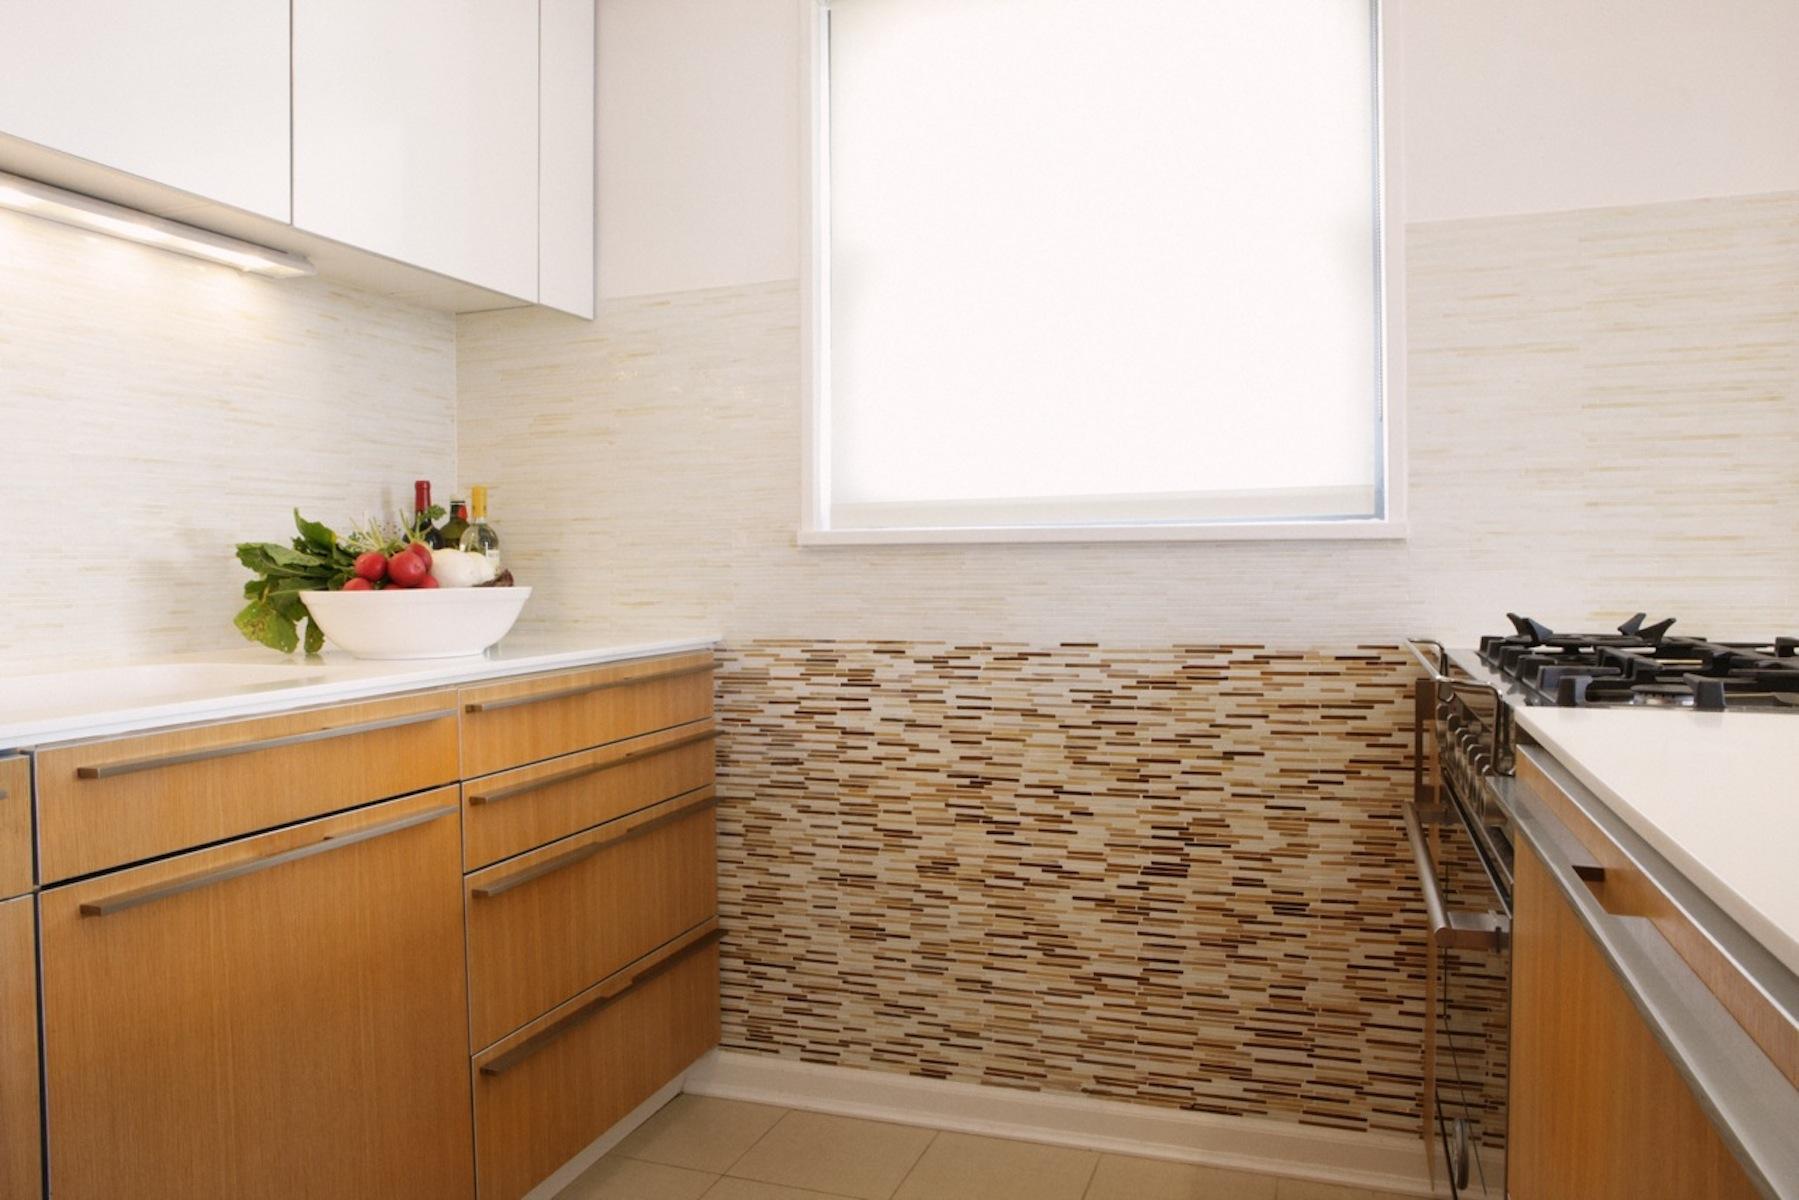 3 Kitchen.jpeg